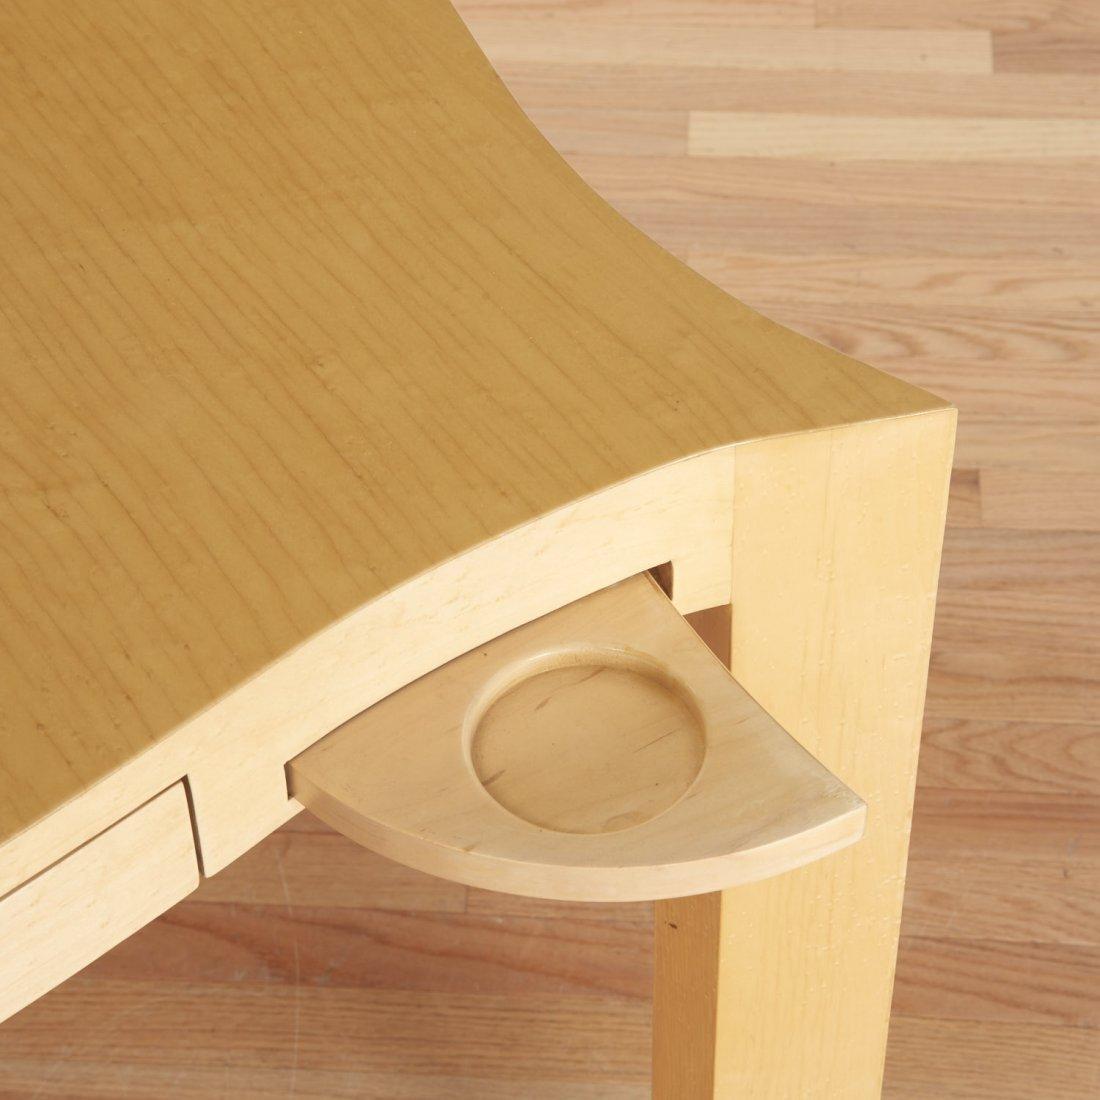 Designer shaped blonde wood bridge table - 4